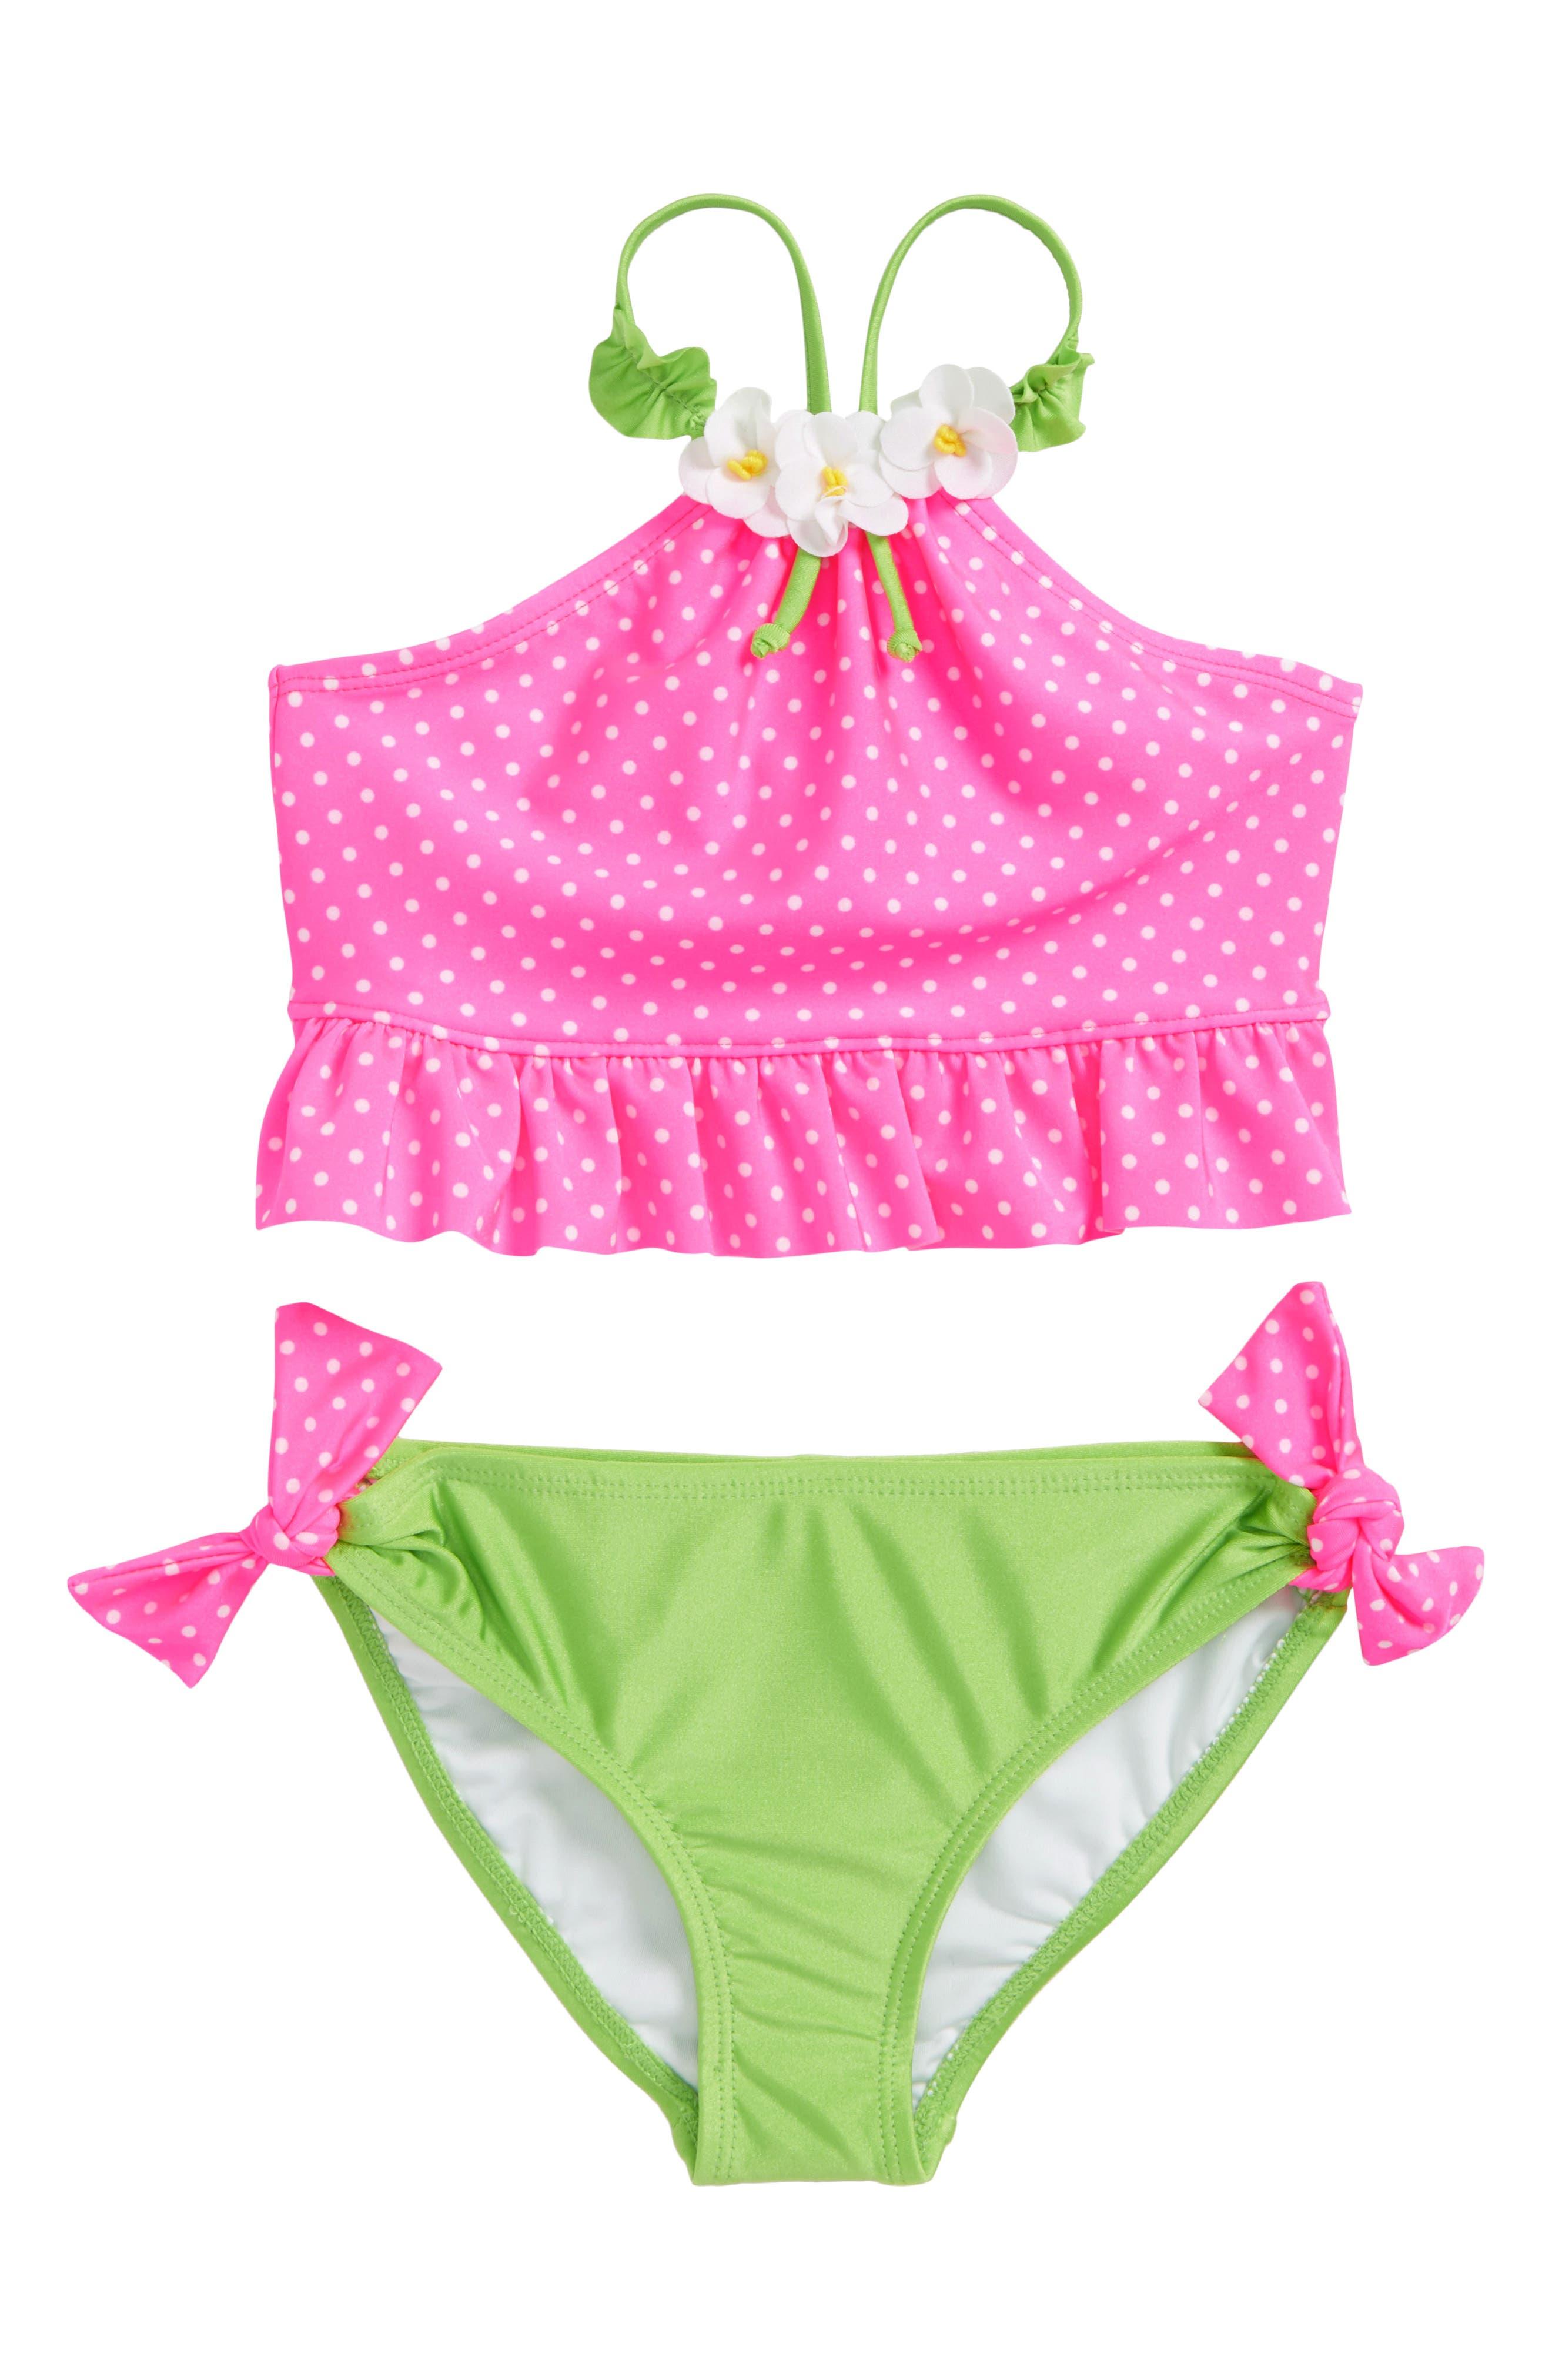 Main Image - Love U Lots Dot Halter Two-Piece Swimsuit (Toddler Girls & Little Girls)